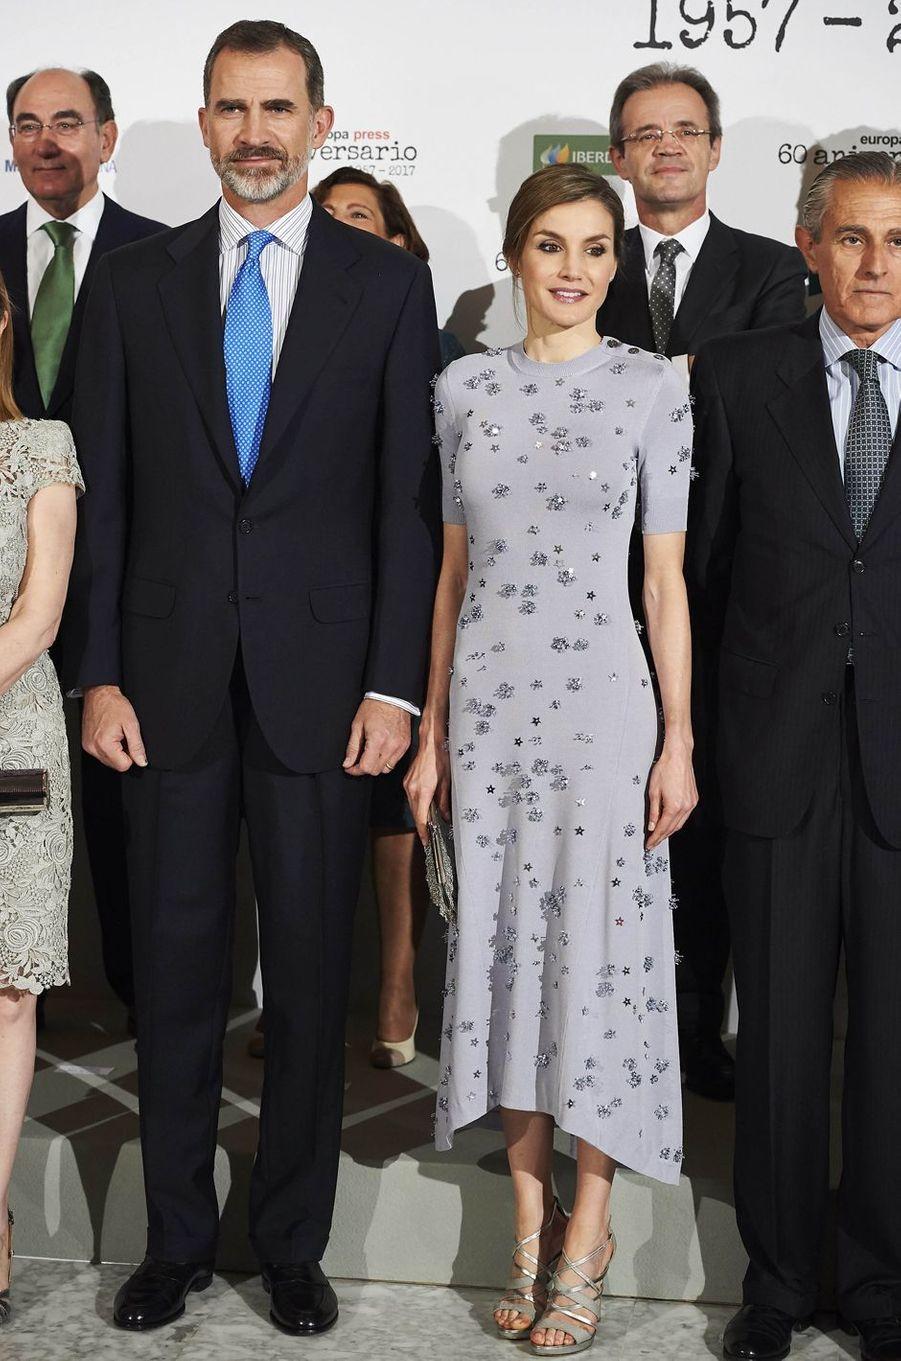 La reine Letizia d'Espagne en Nina Ricci, le 30 mai 2017